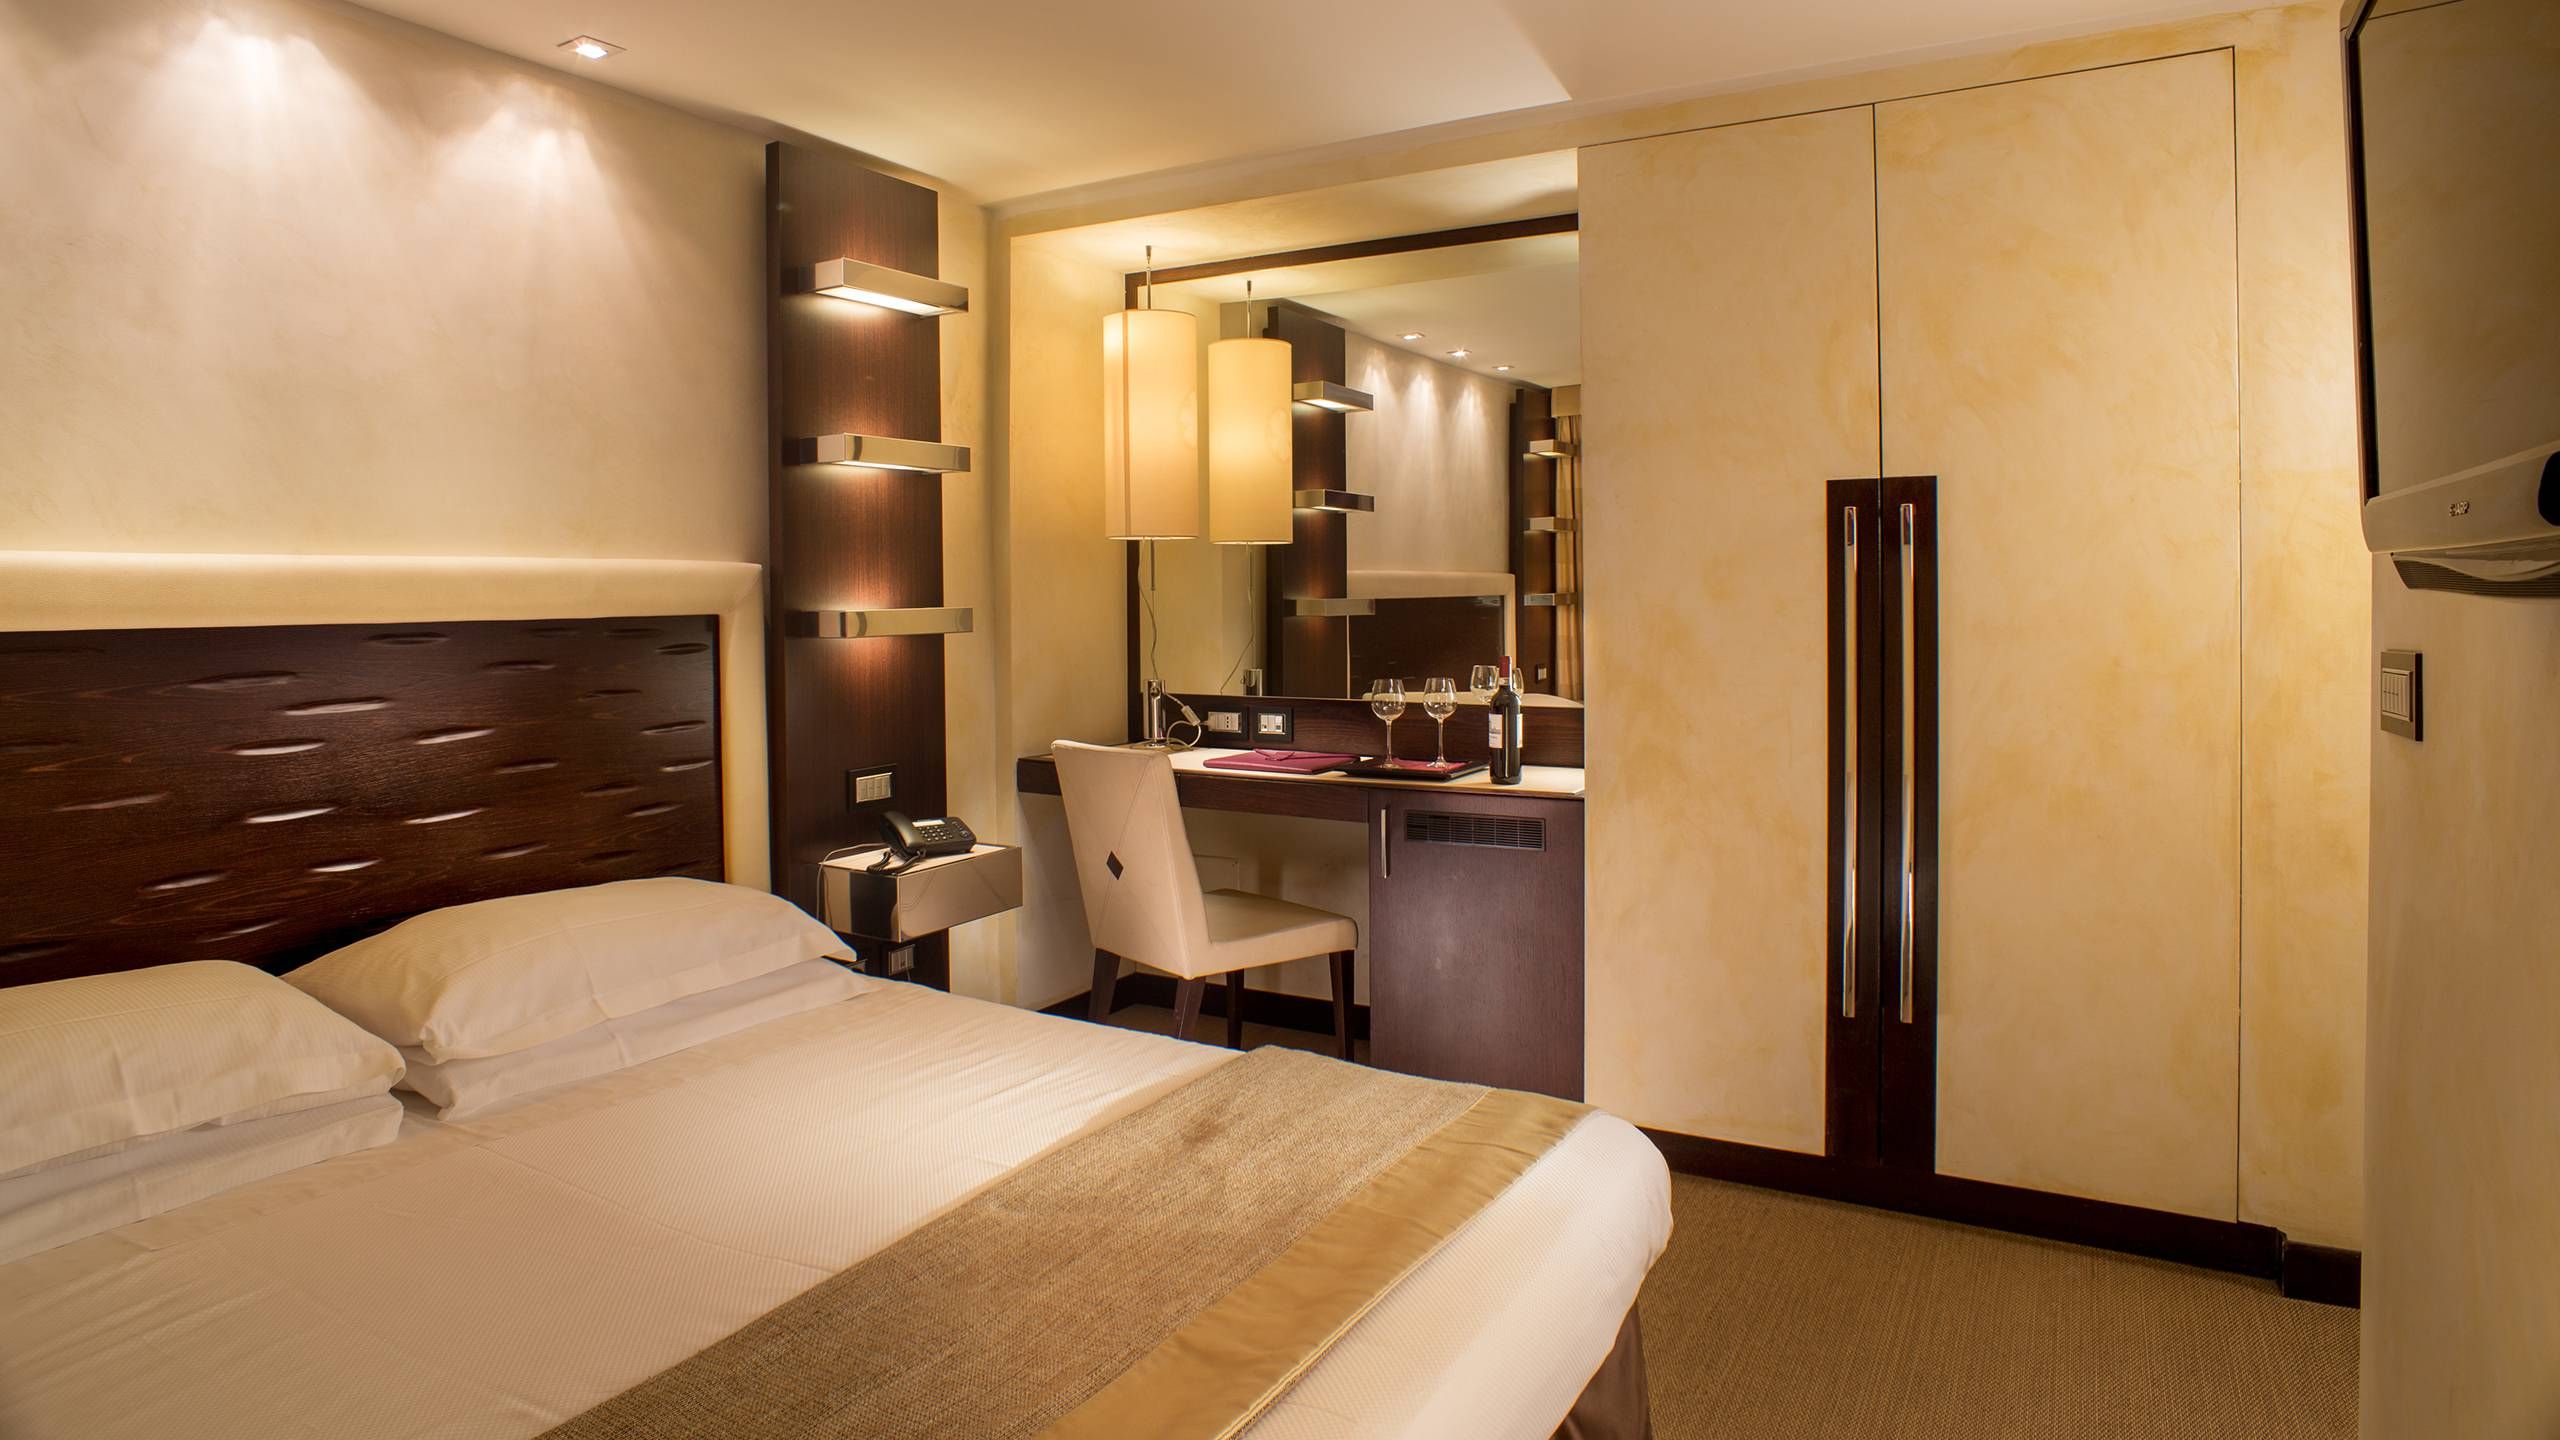 02-Les-Fleurs-Luxury-House-Rome-room